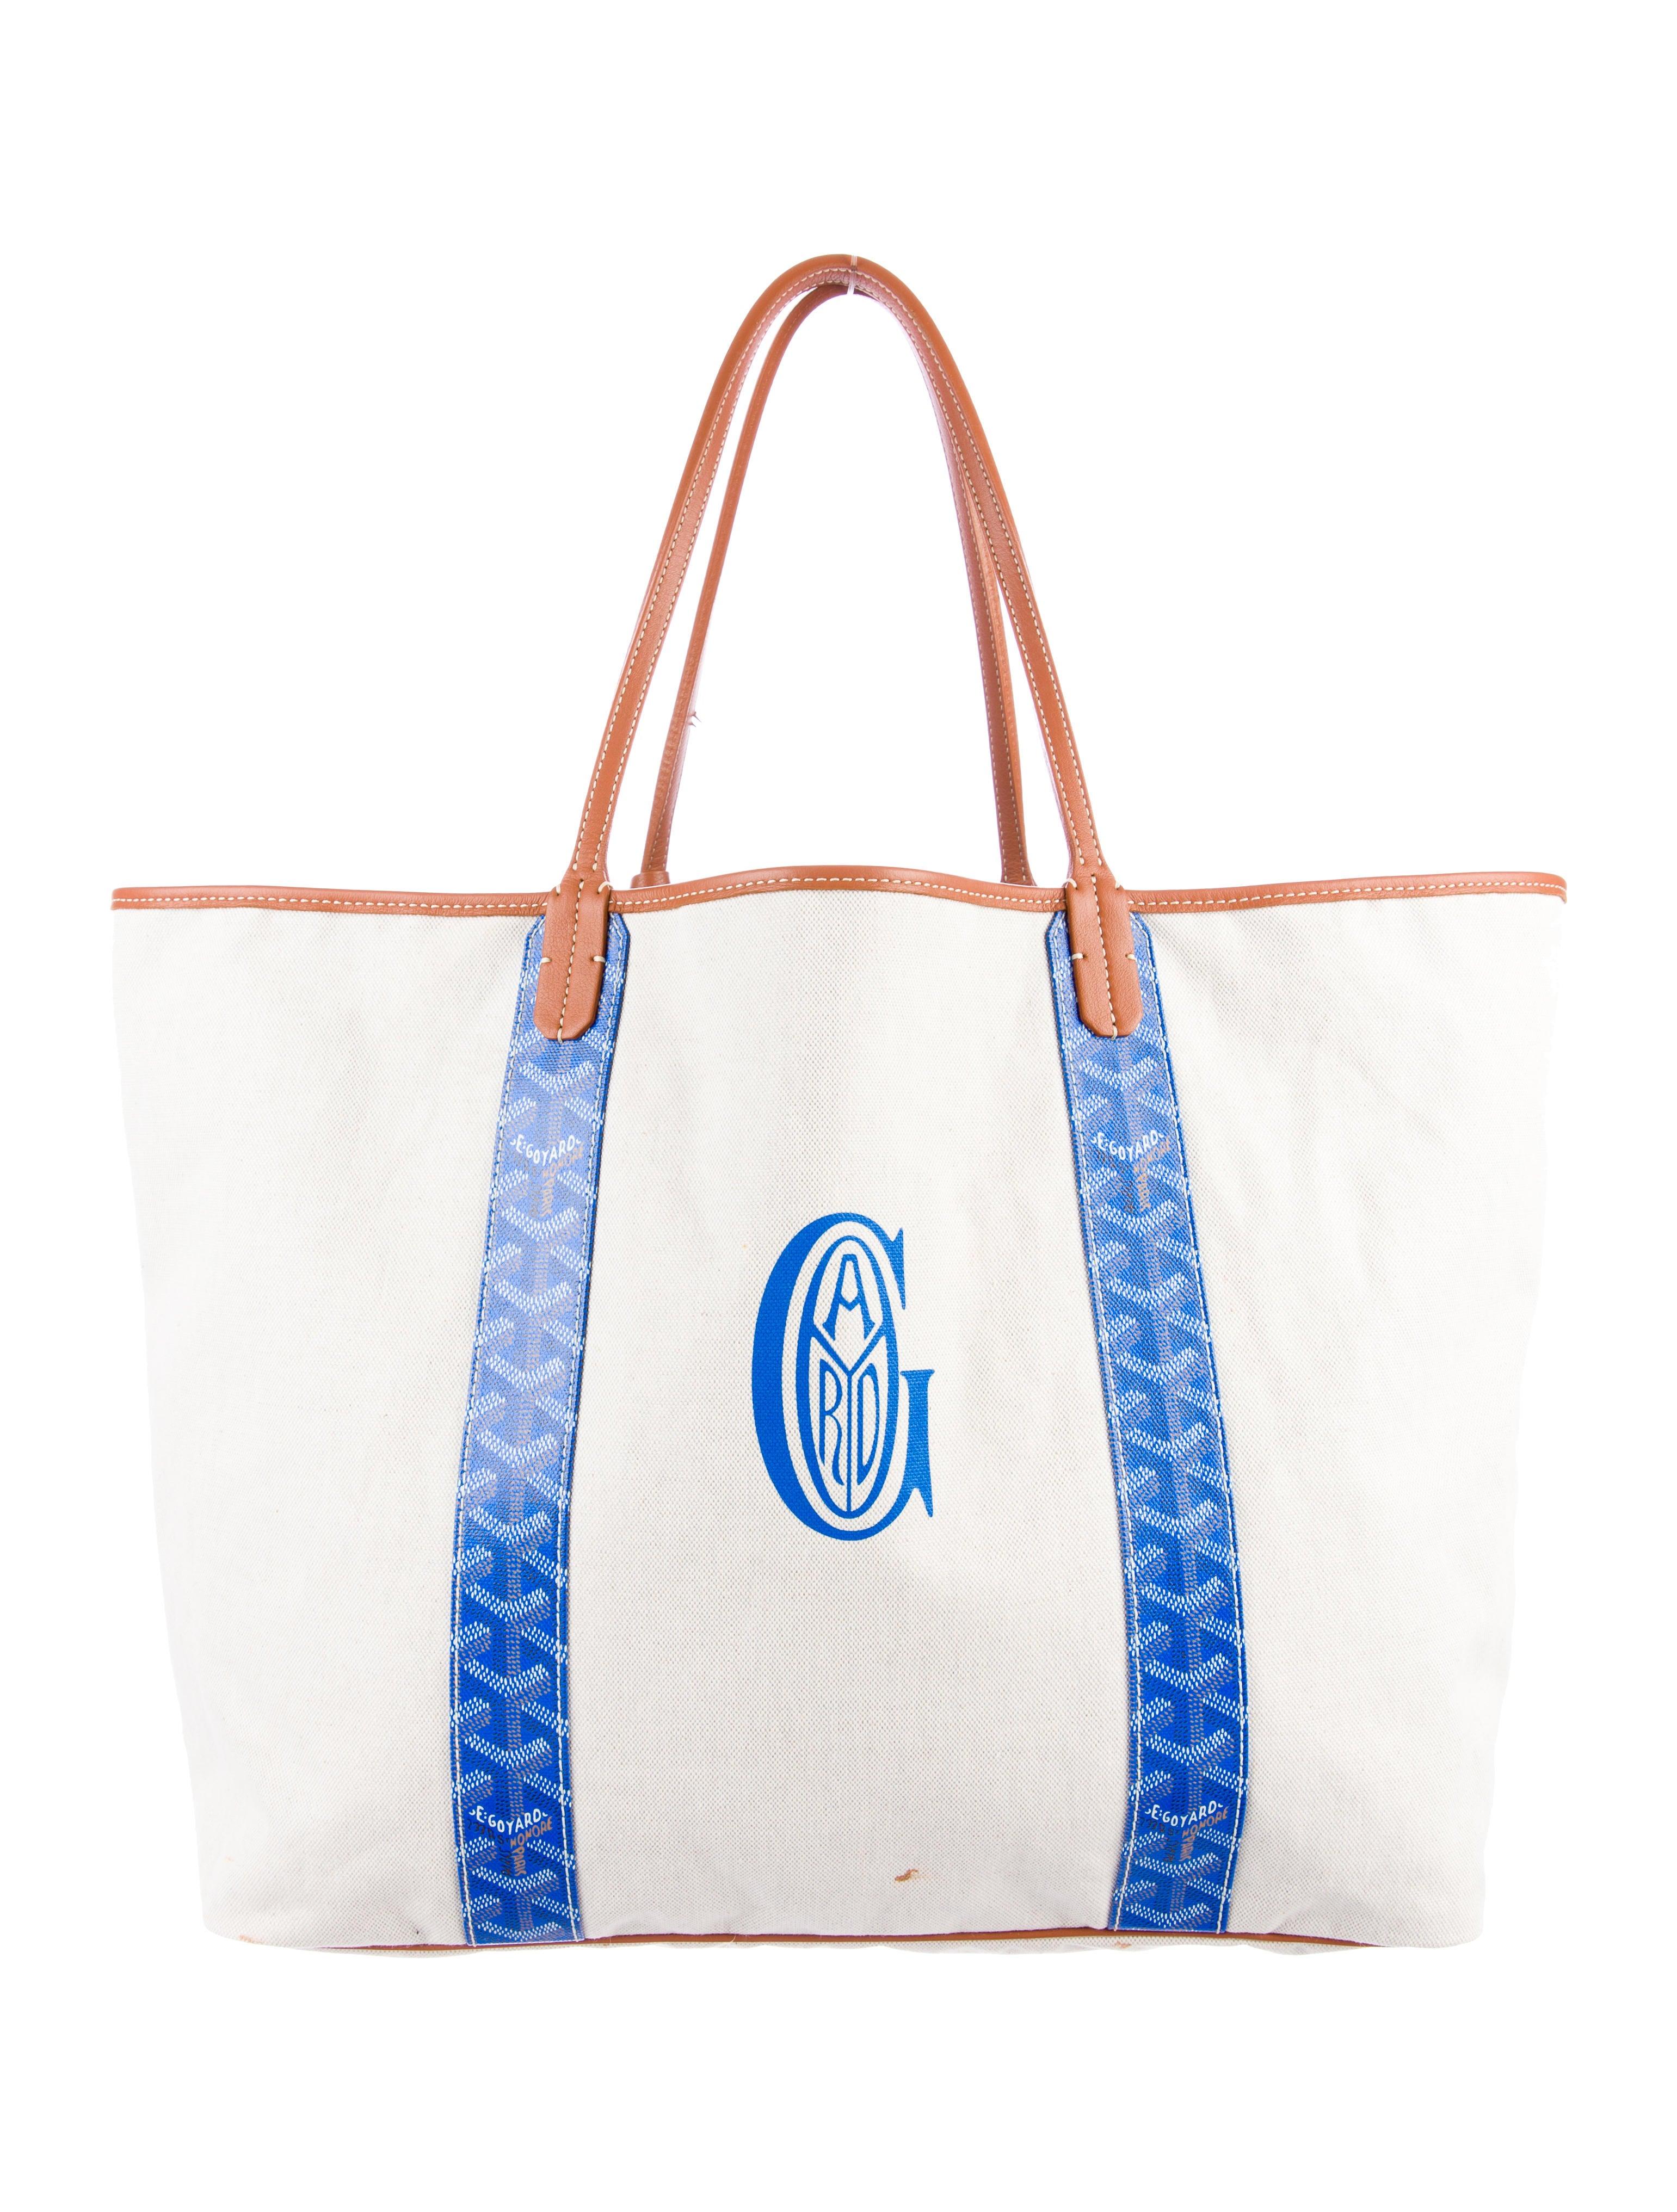 948133e7f6fb Goyard 2017 Goyardine St Louis Pertuis GM - Handbags - GOY21725 ...